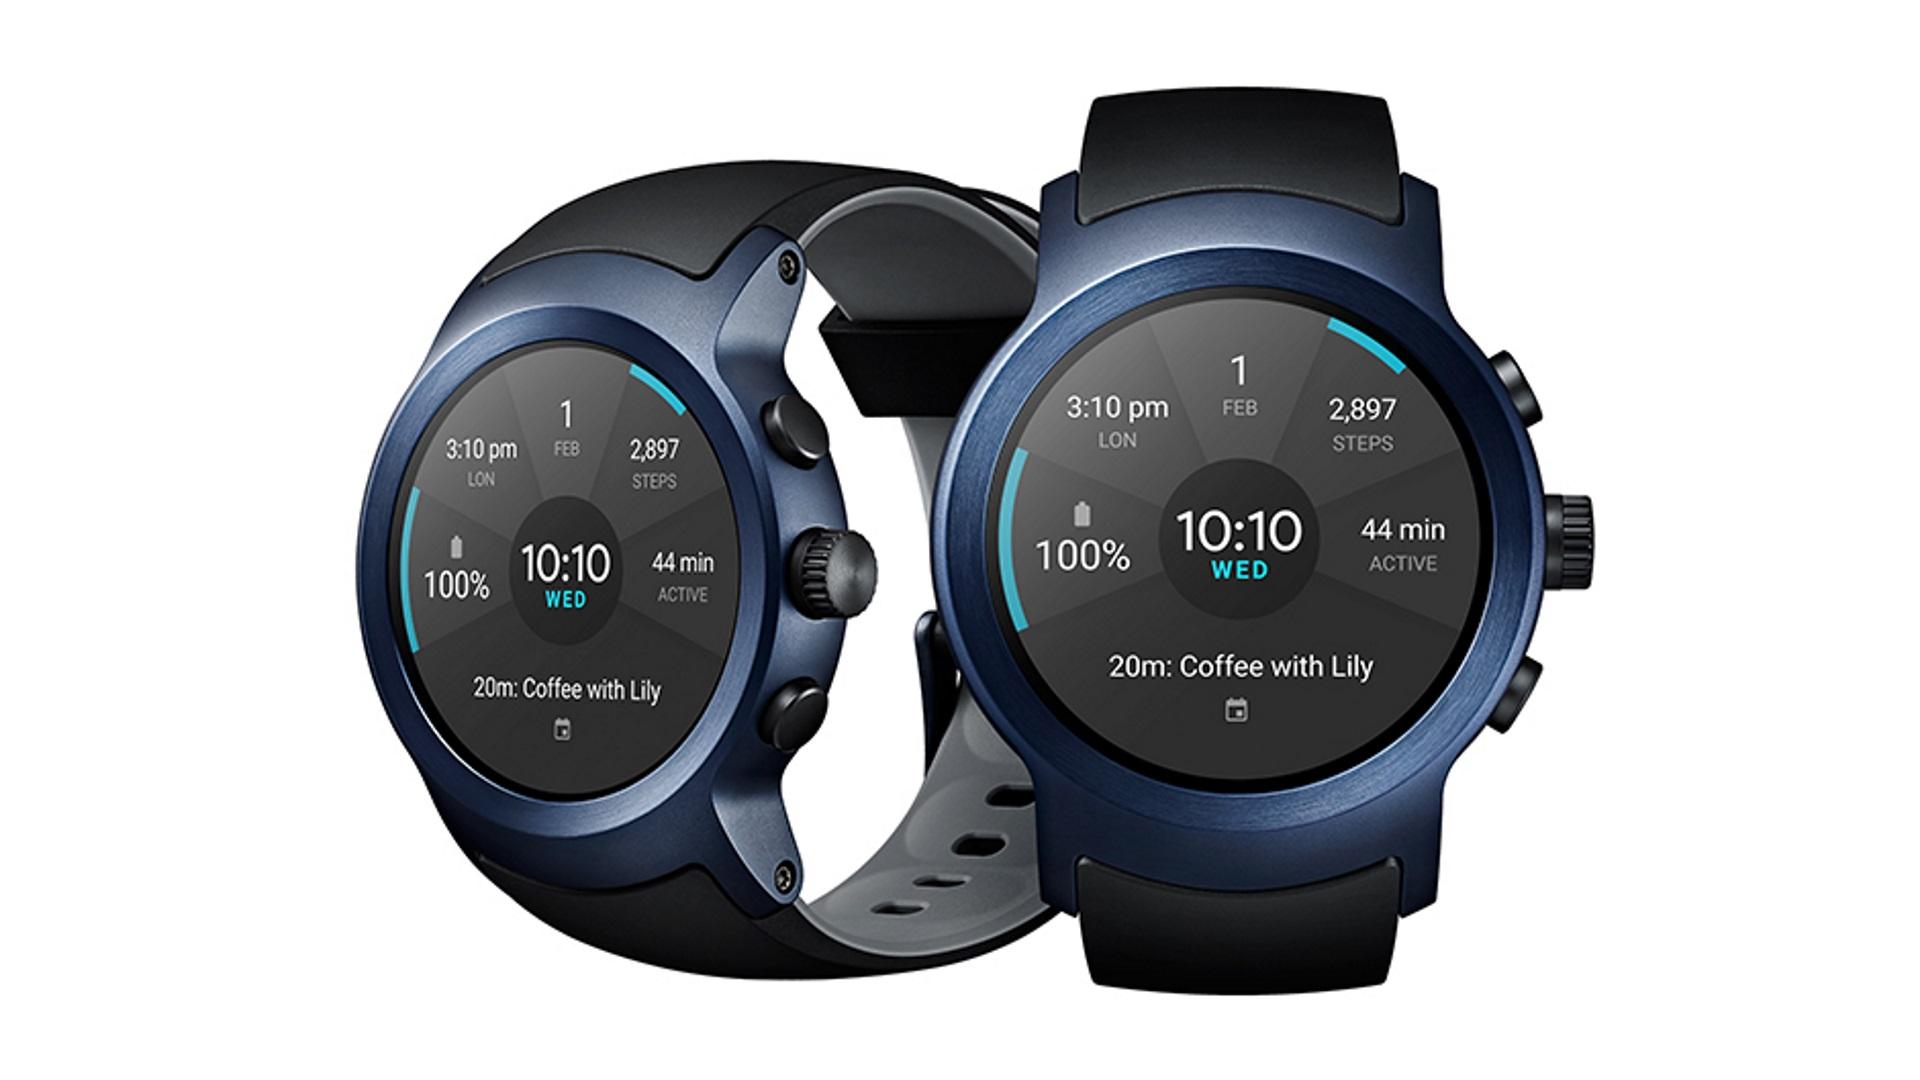 「LG Watch Sport」は台湾でも発売へ、LTEはBand 3のみ